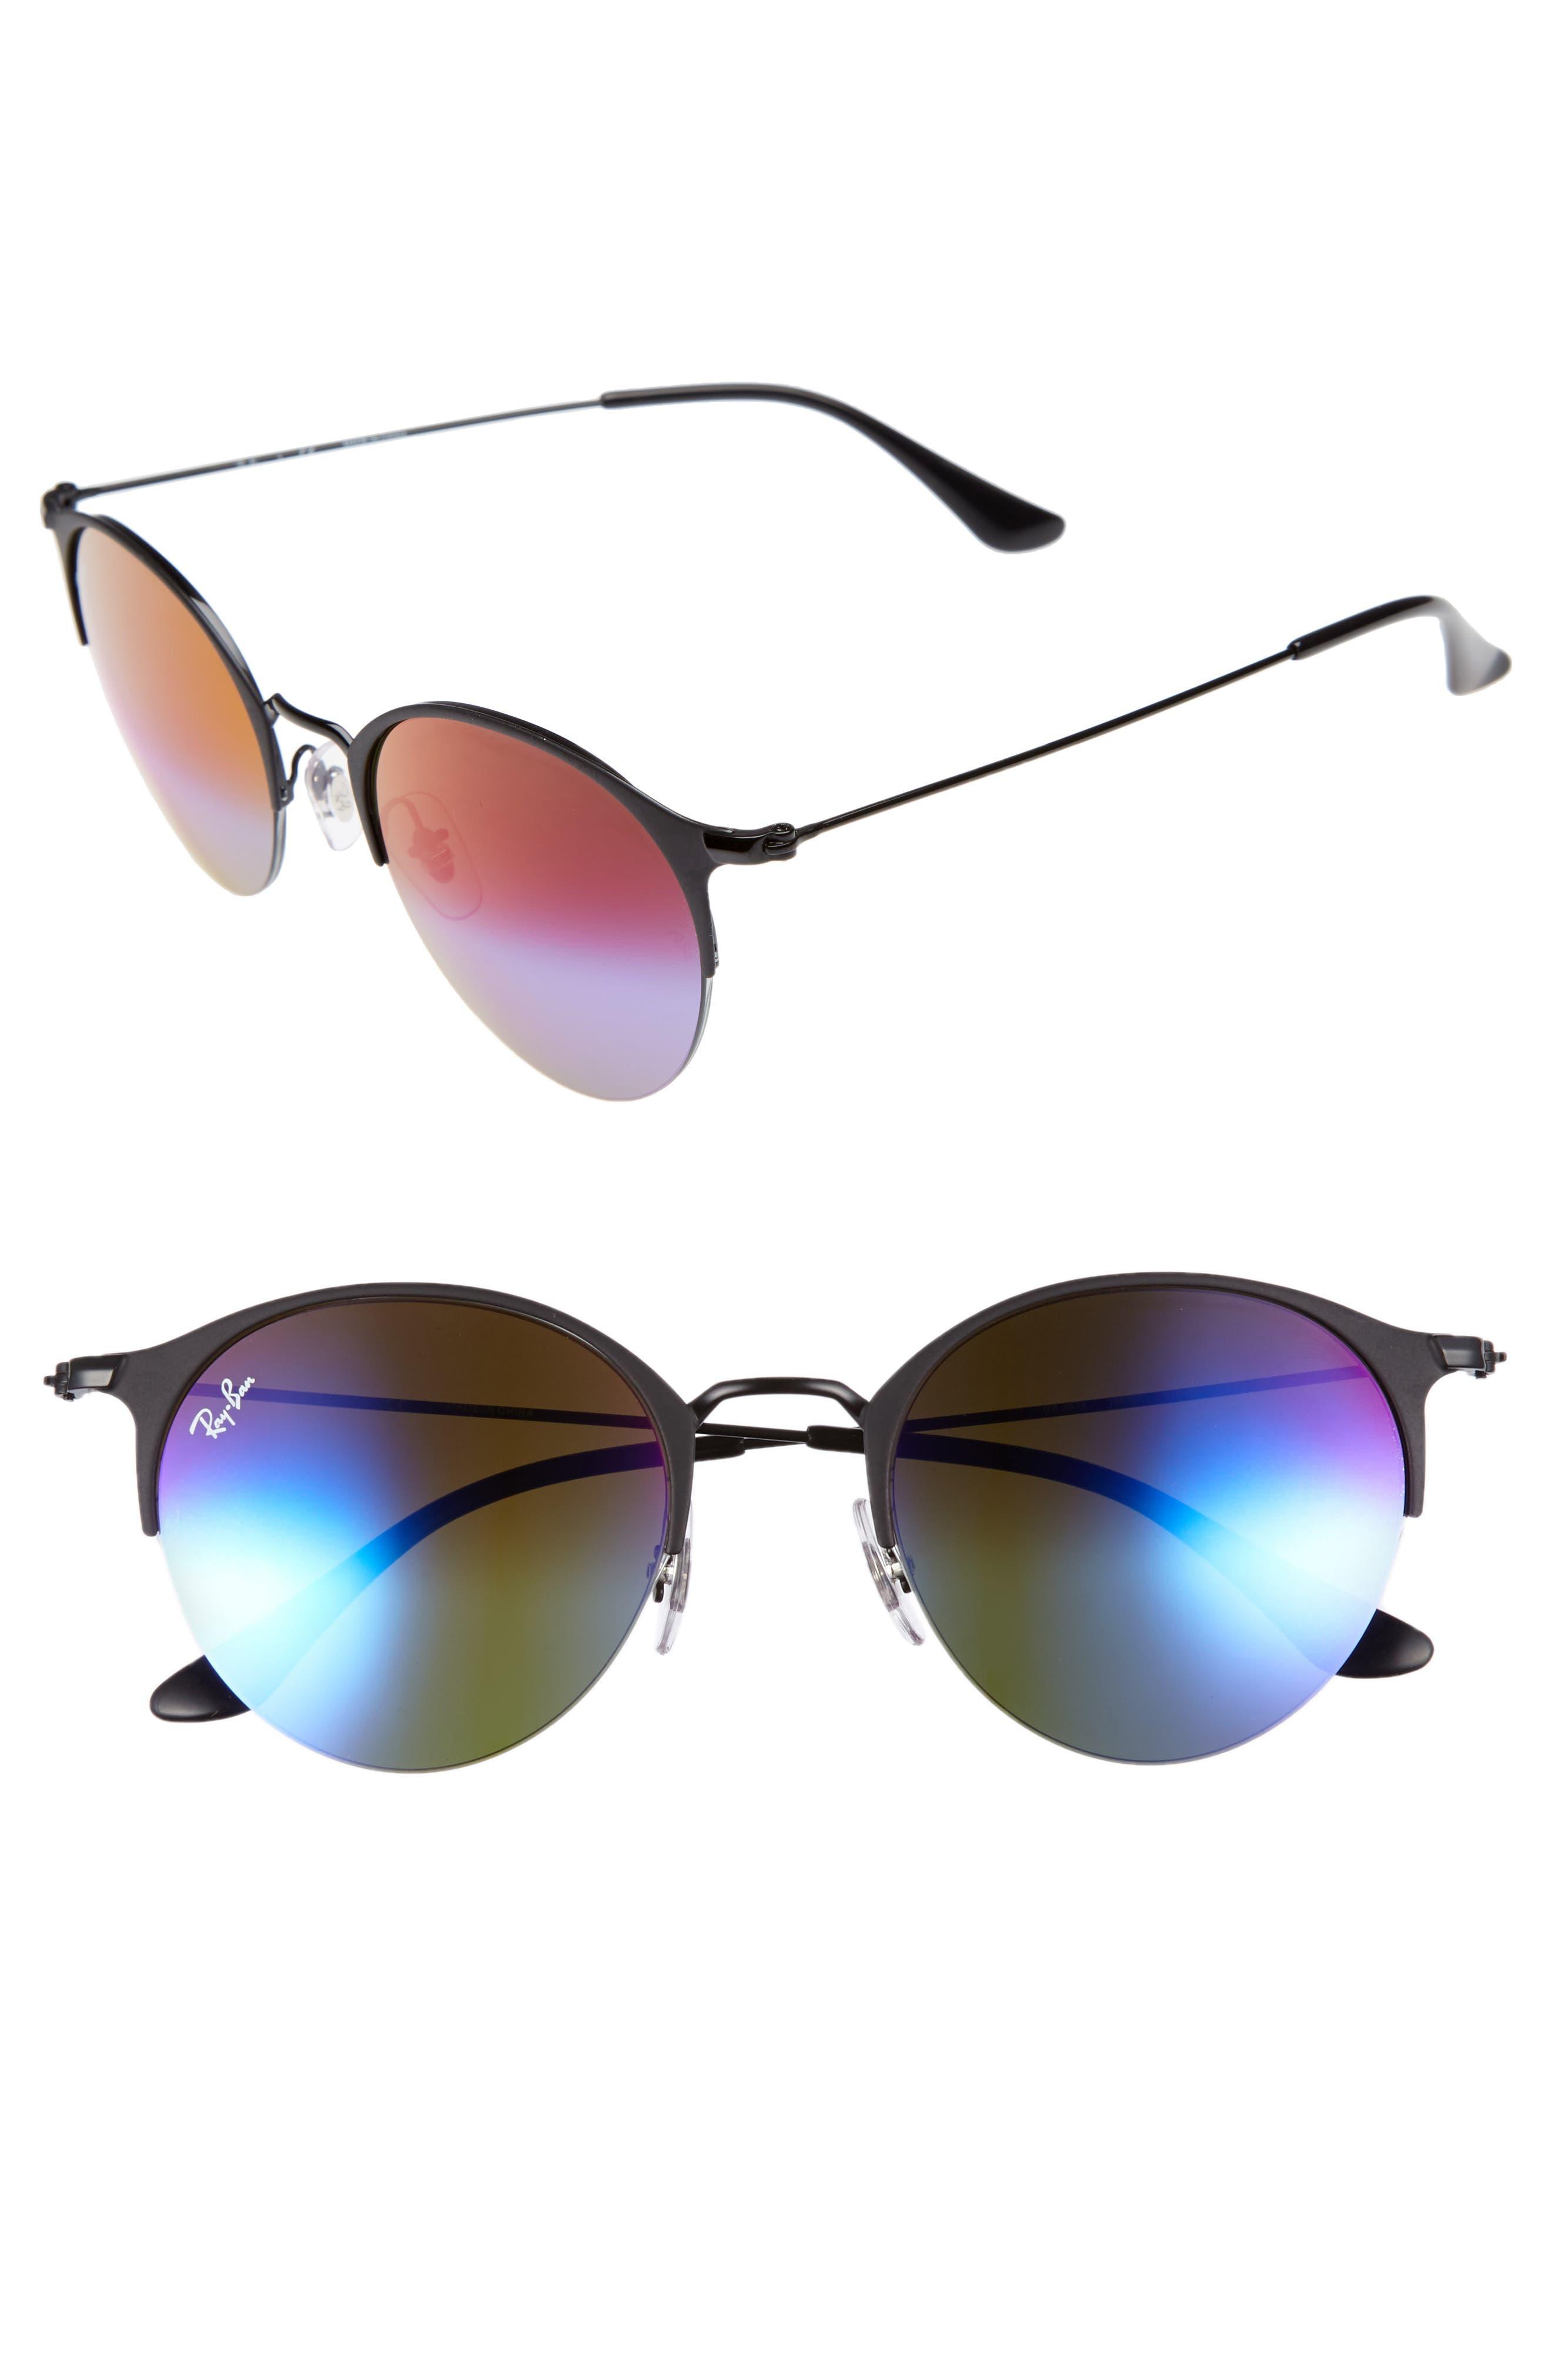 50mm Gradient Mirrored Sunglasses,                         Main,                         color, Matte Black